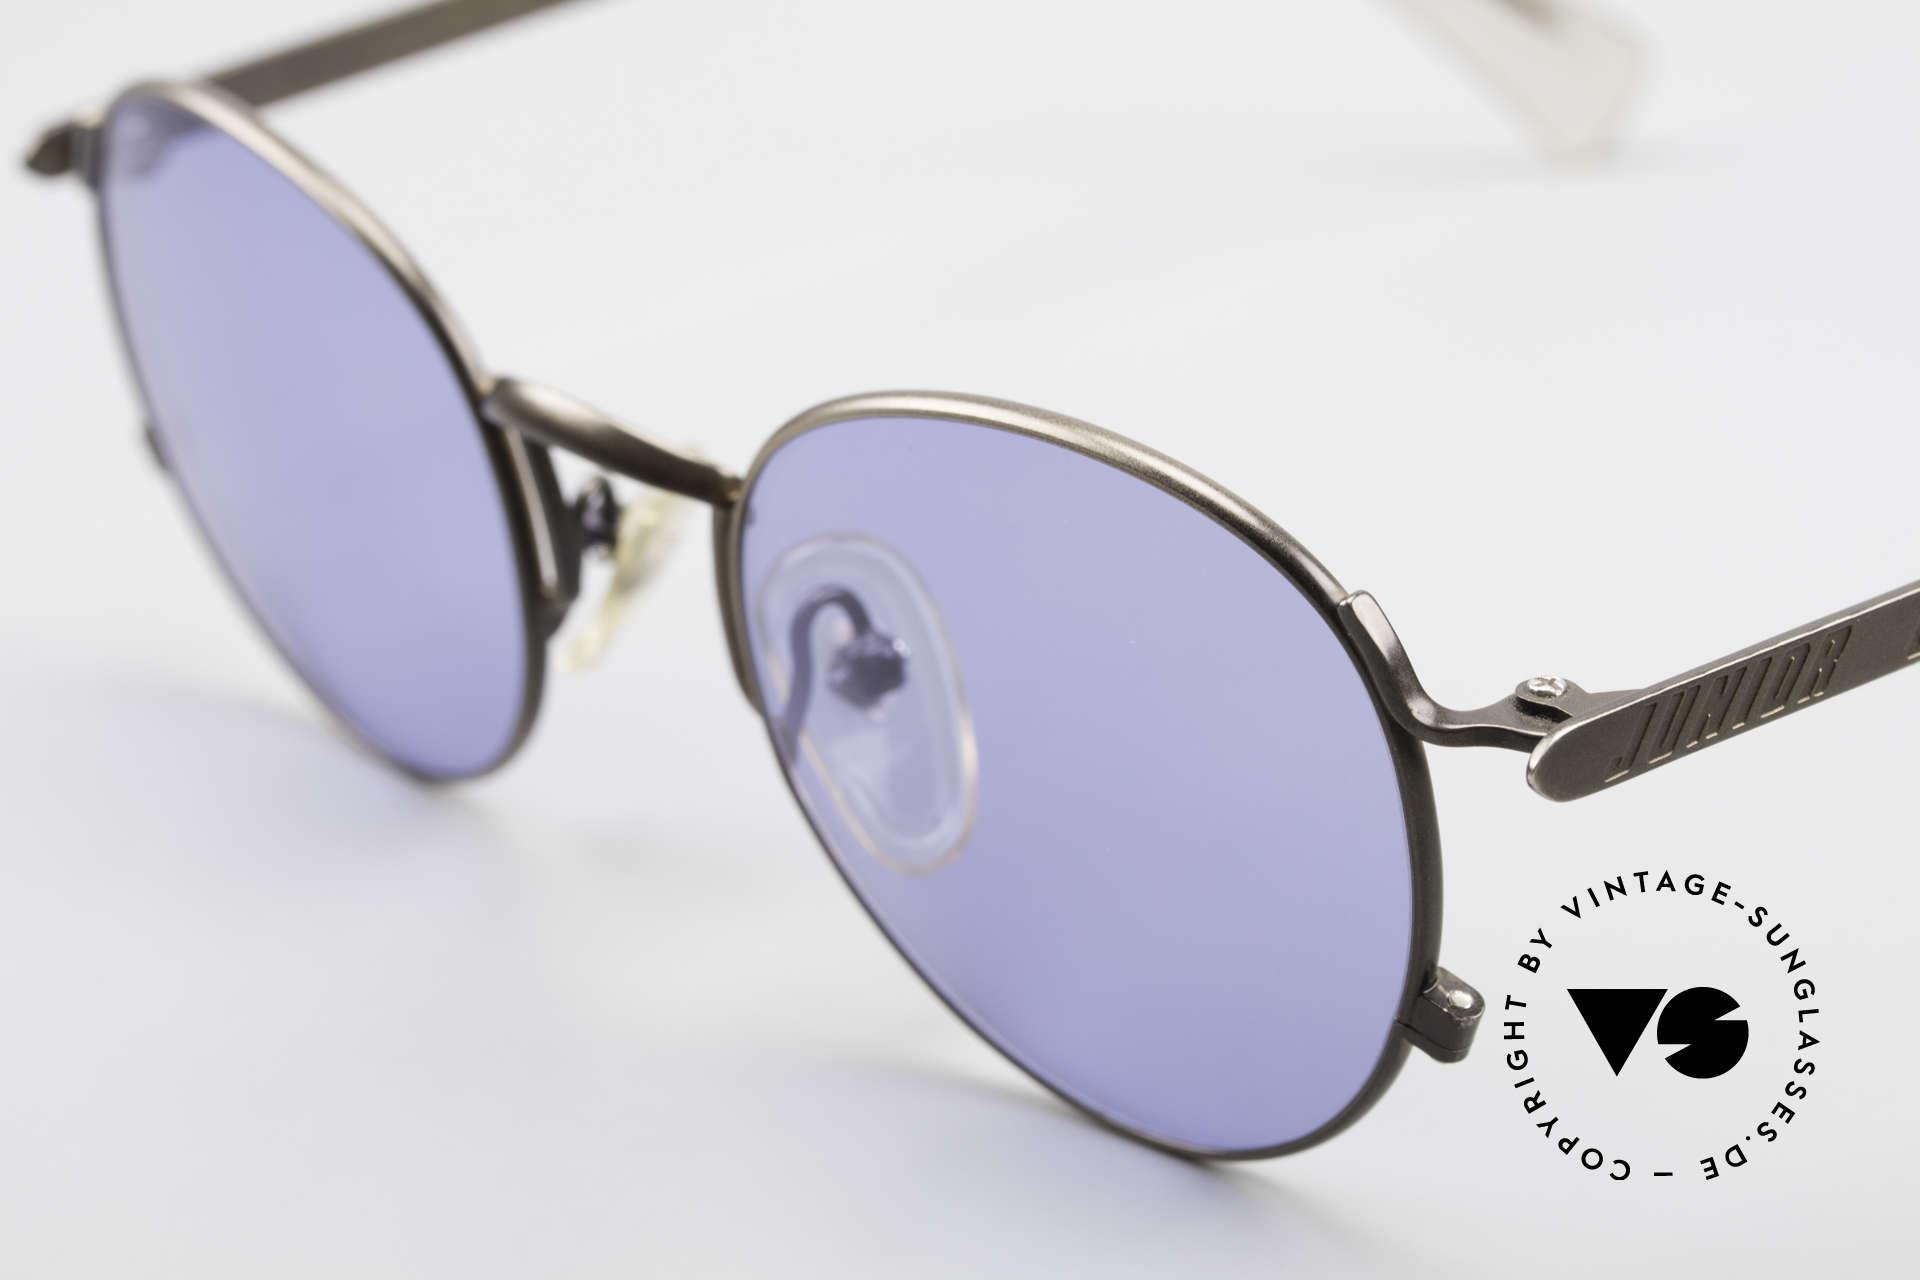 Jean Paul Gaultier 57-1171 90's Designer Sunglasses JPG, NO RETRO FASHION, but an original from 1995/96, Made for Men and Women